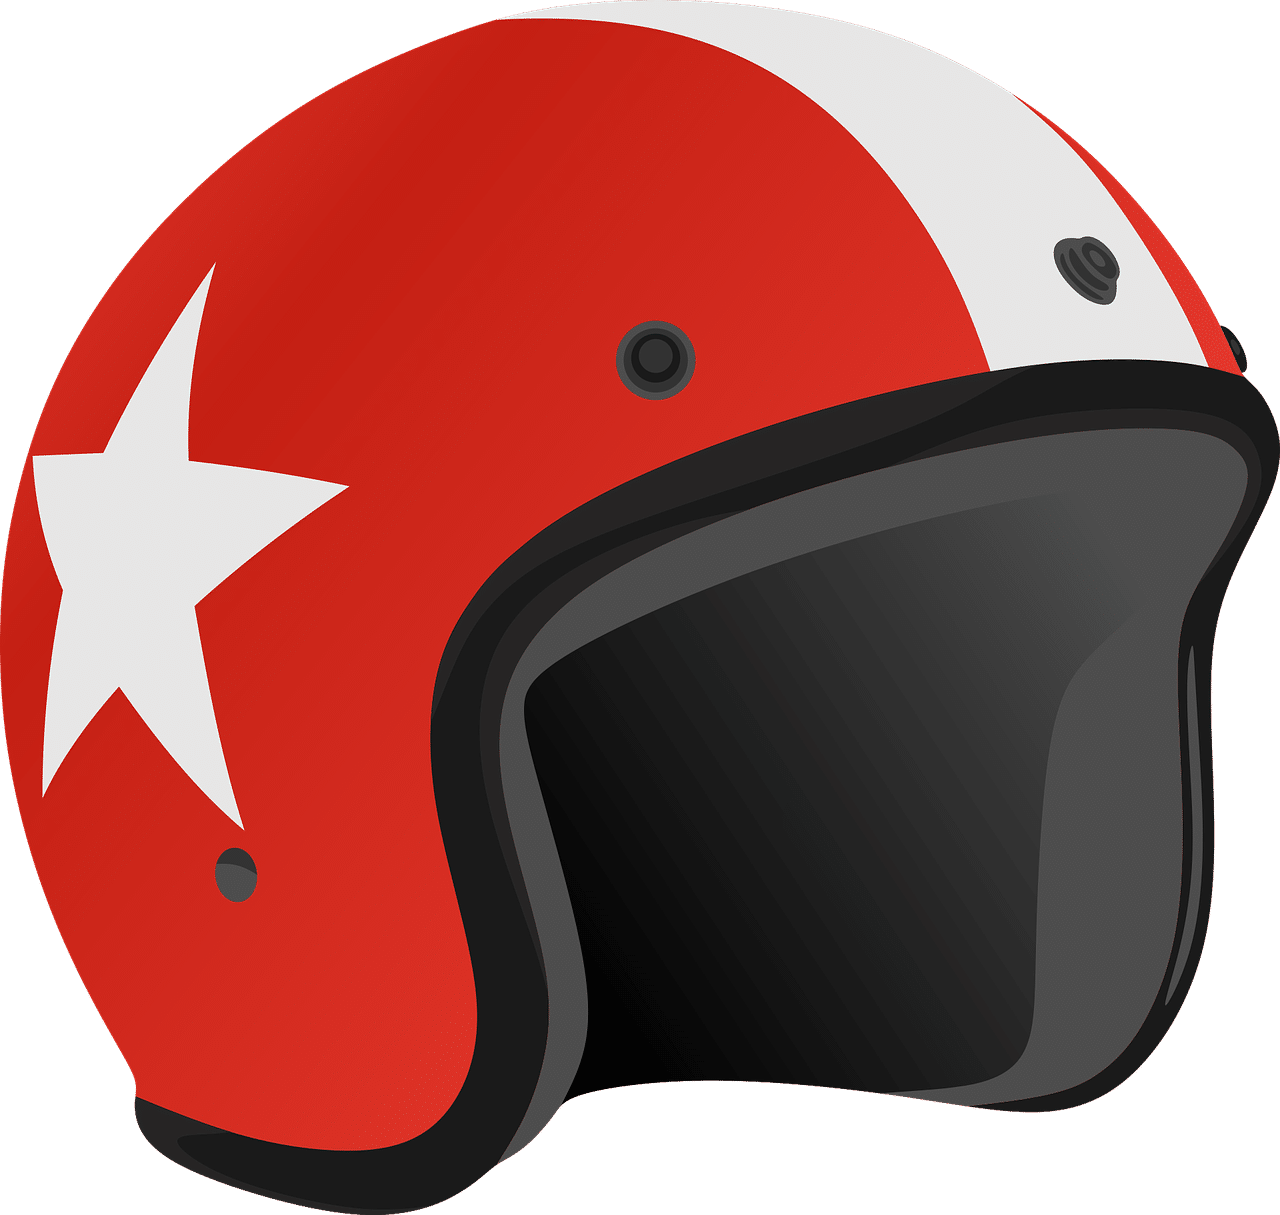 helm-2060063_1280